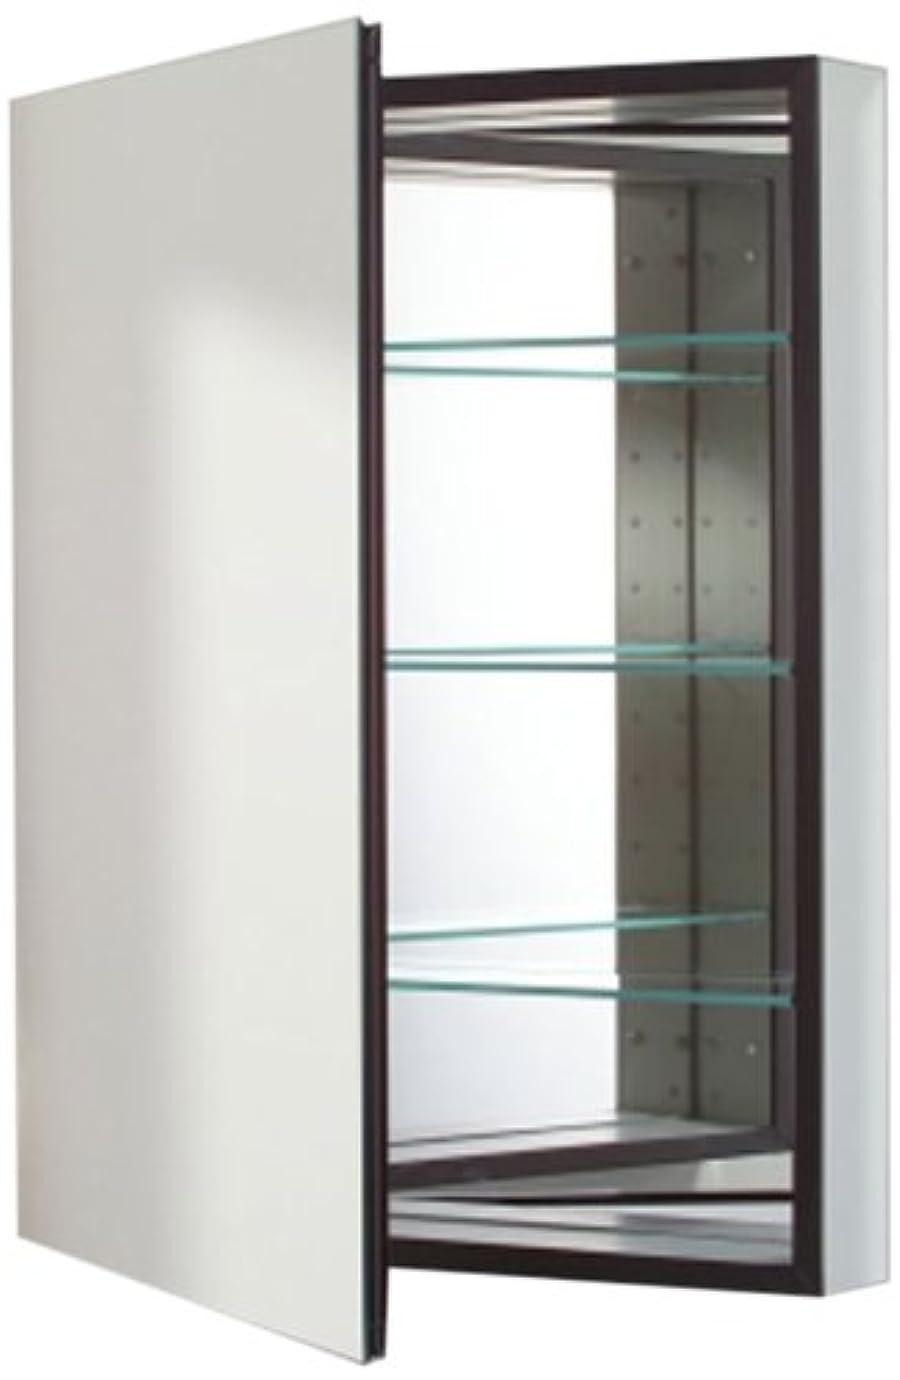 Robern cb-mt24d4fpll Mシリーズ左側フラットミラーMedicine Cabinet with Defogger andライト